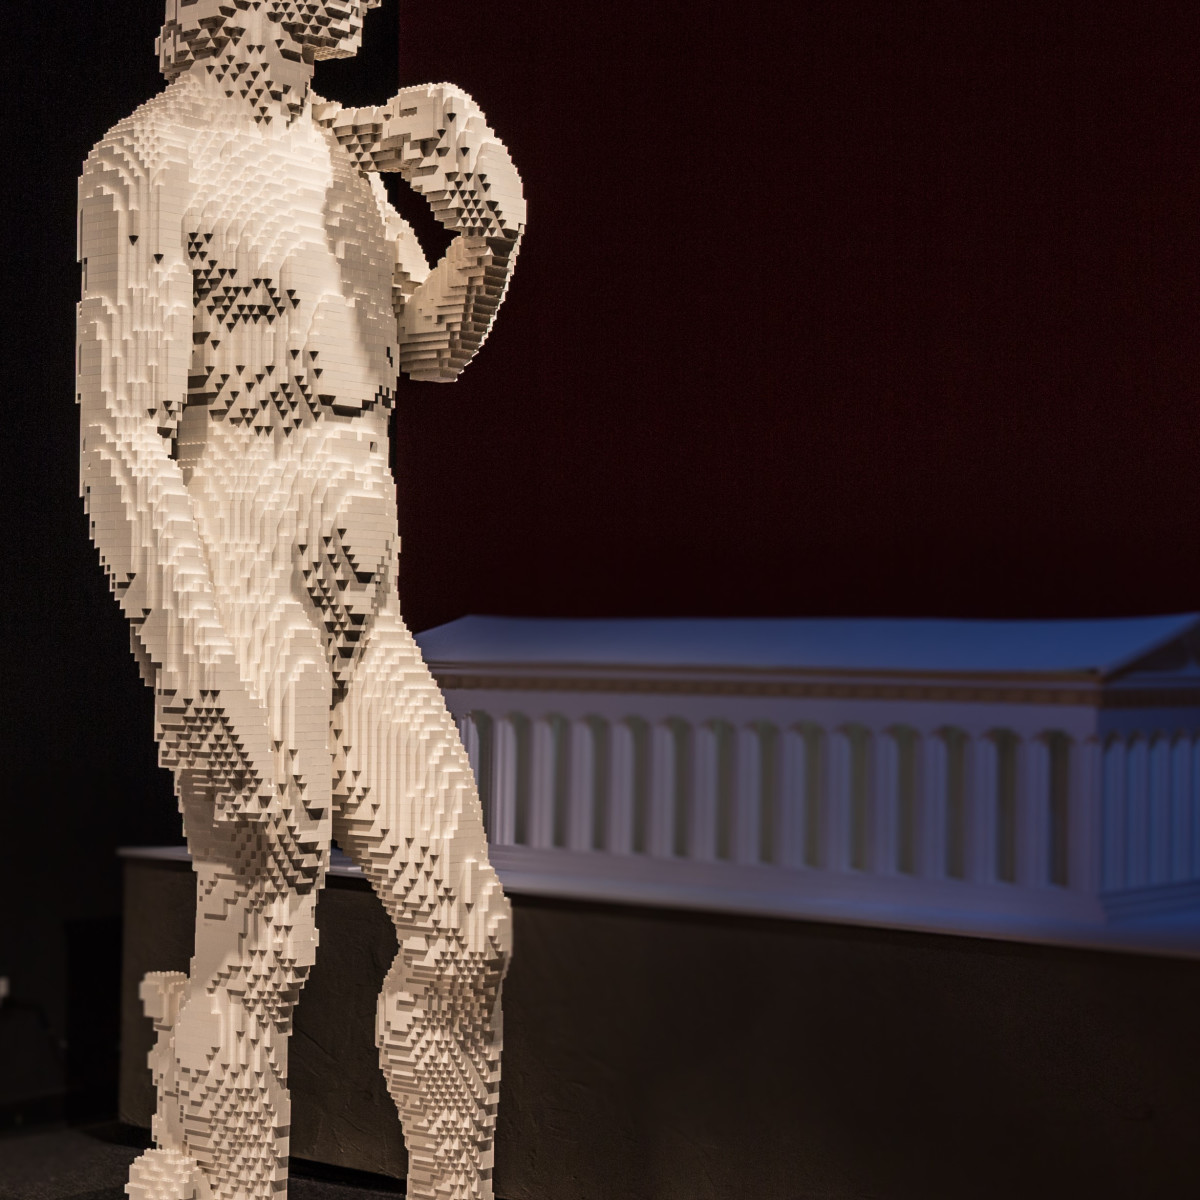 Perot Museum Art of the Brick, David